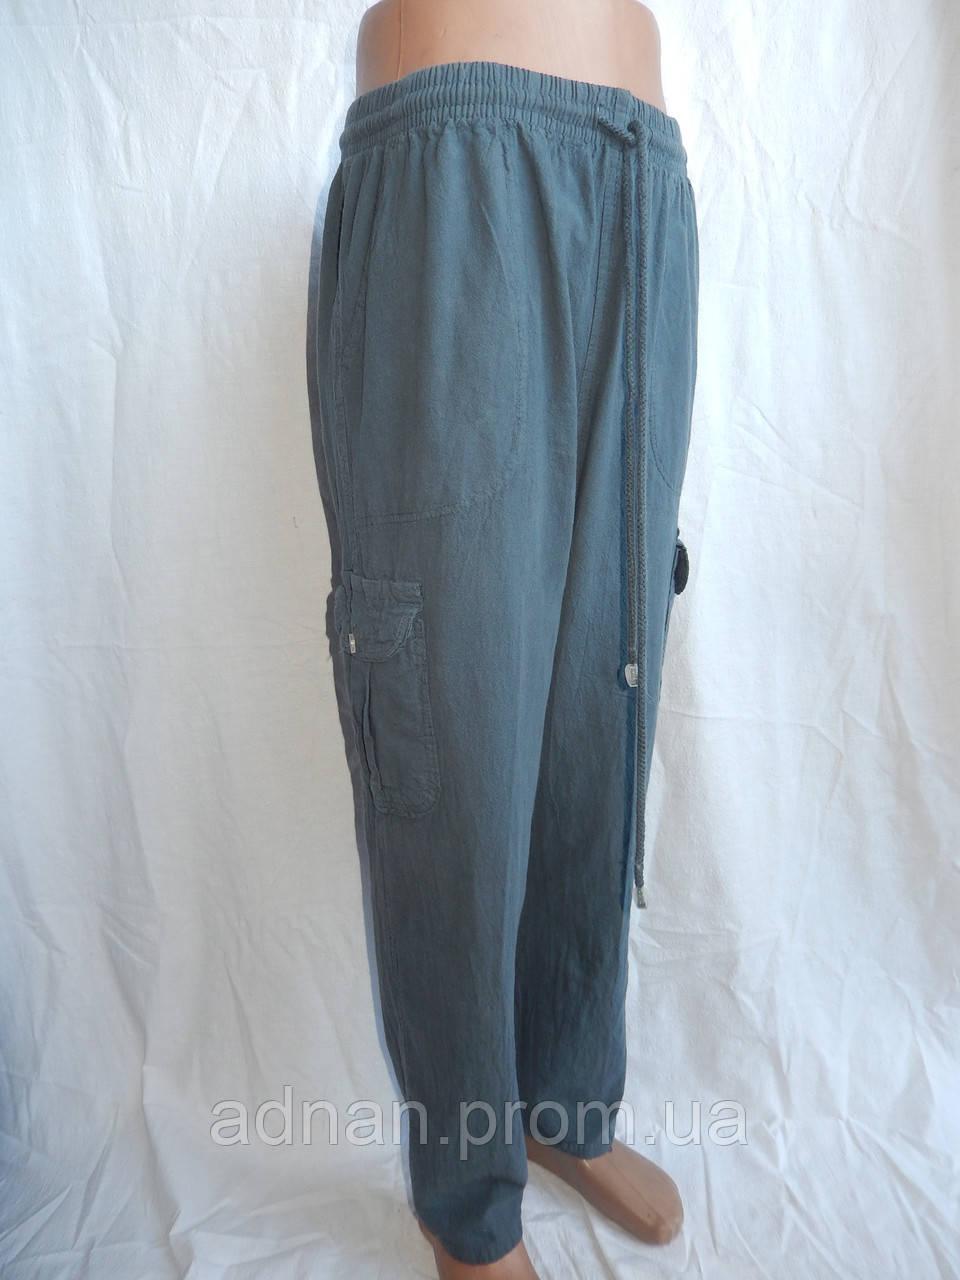 Брюки мужские Жатка, с карманом, норма 002